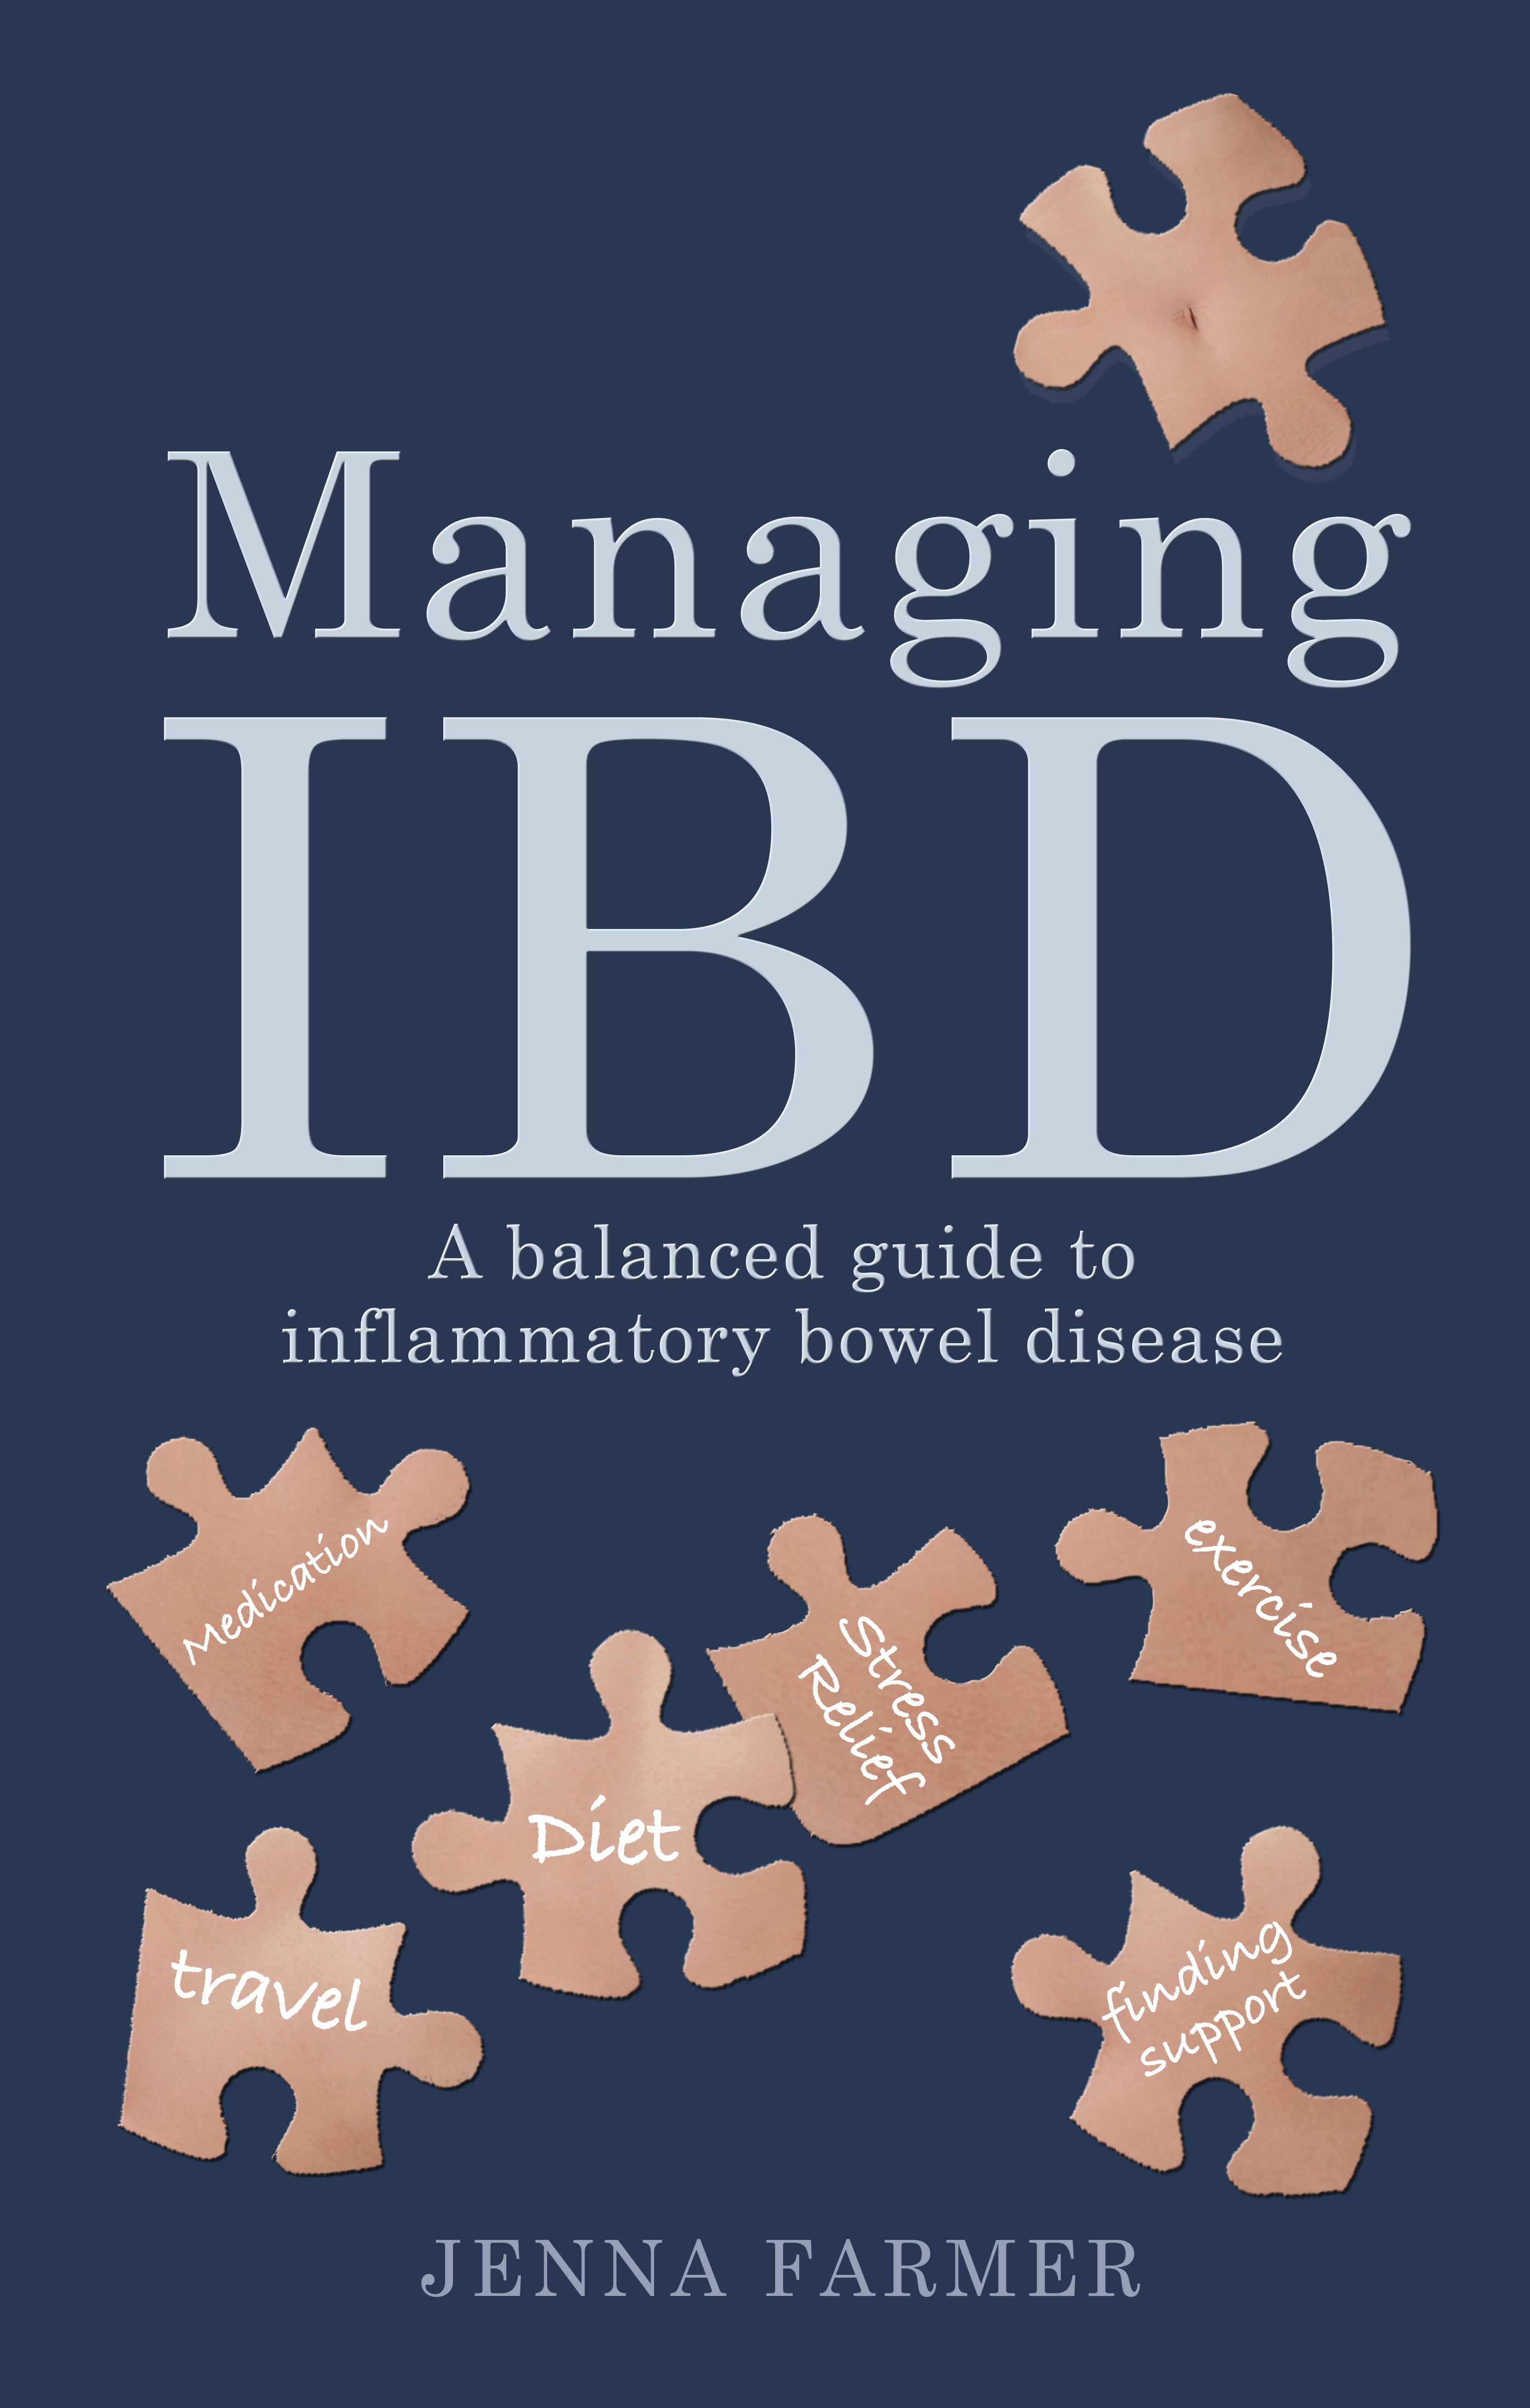 Managing IBD A Balanced Guide to Inflammatory Bowel Disease